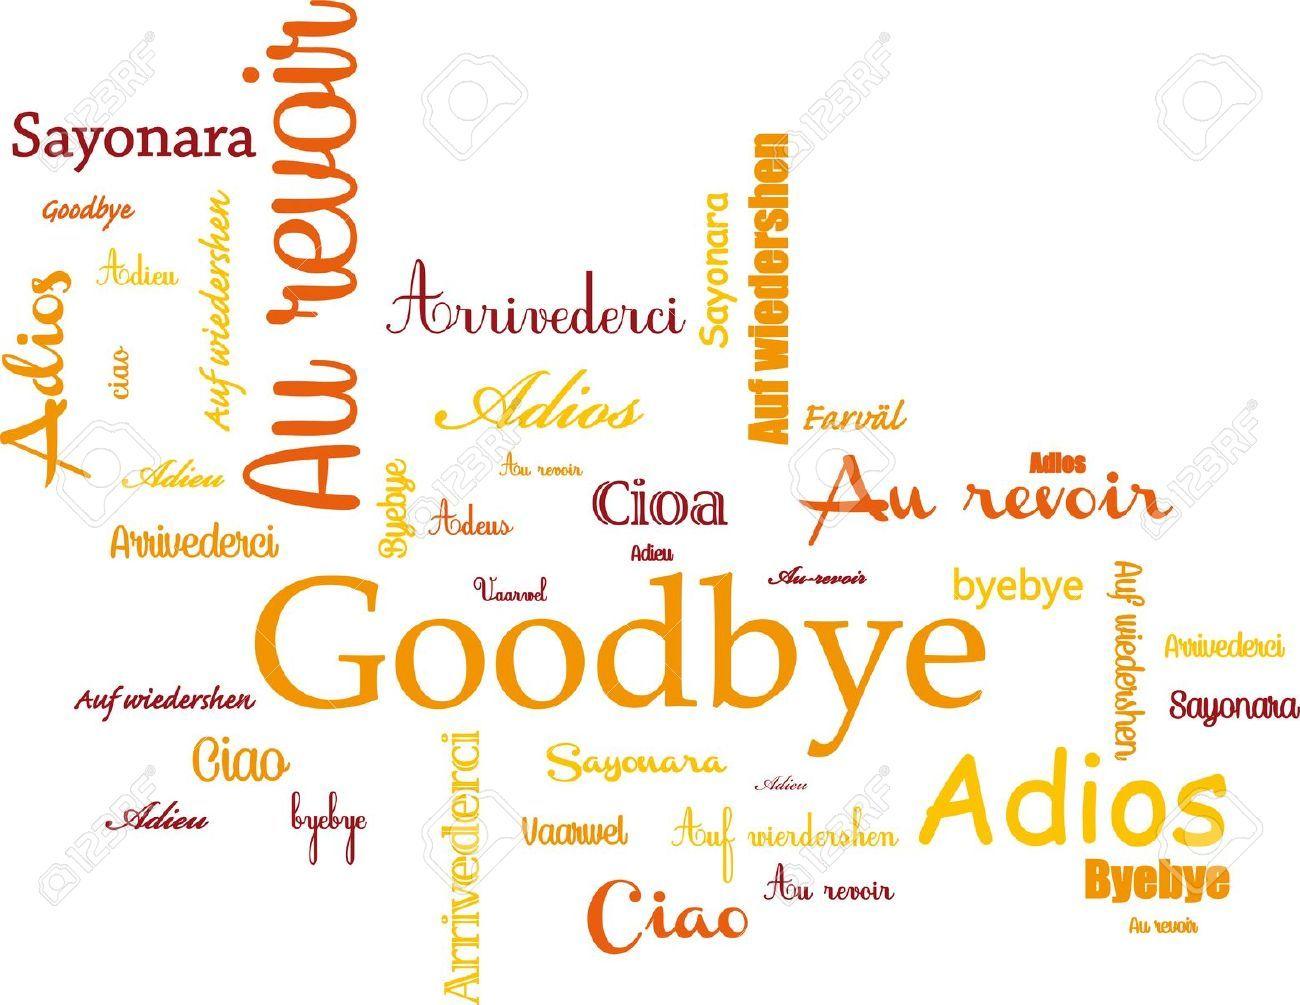 Sayonara, Adieu, Tot Ziens, AufWiedersehen, Bye bye